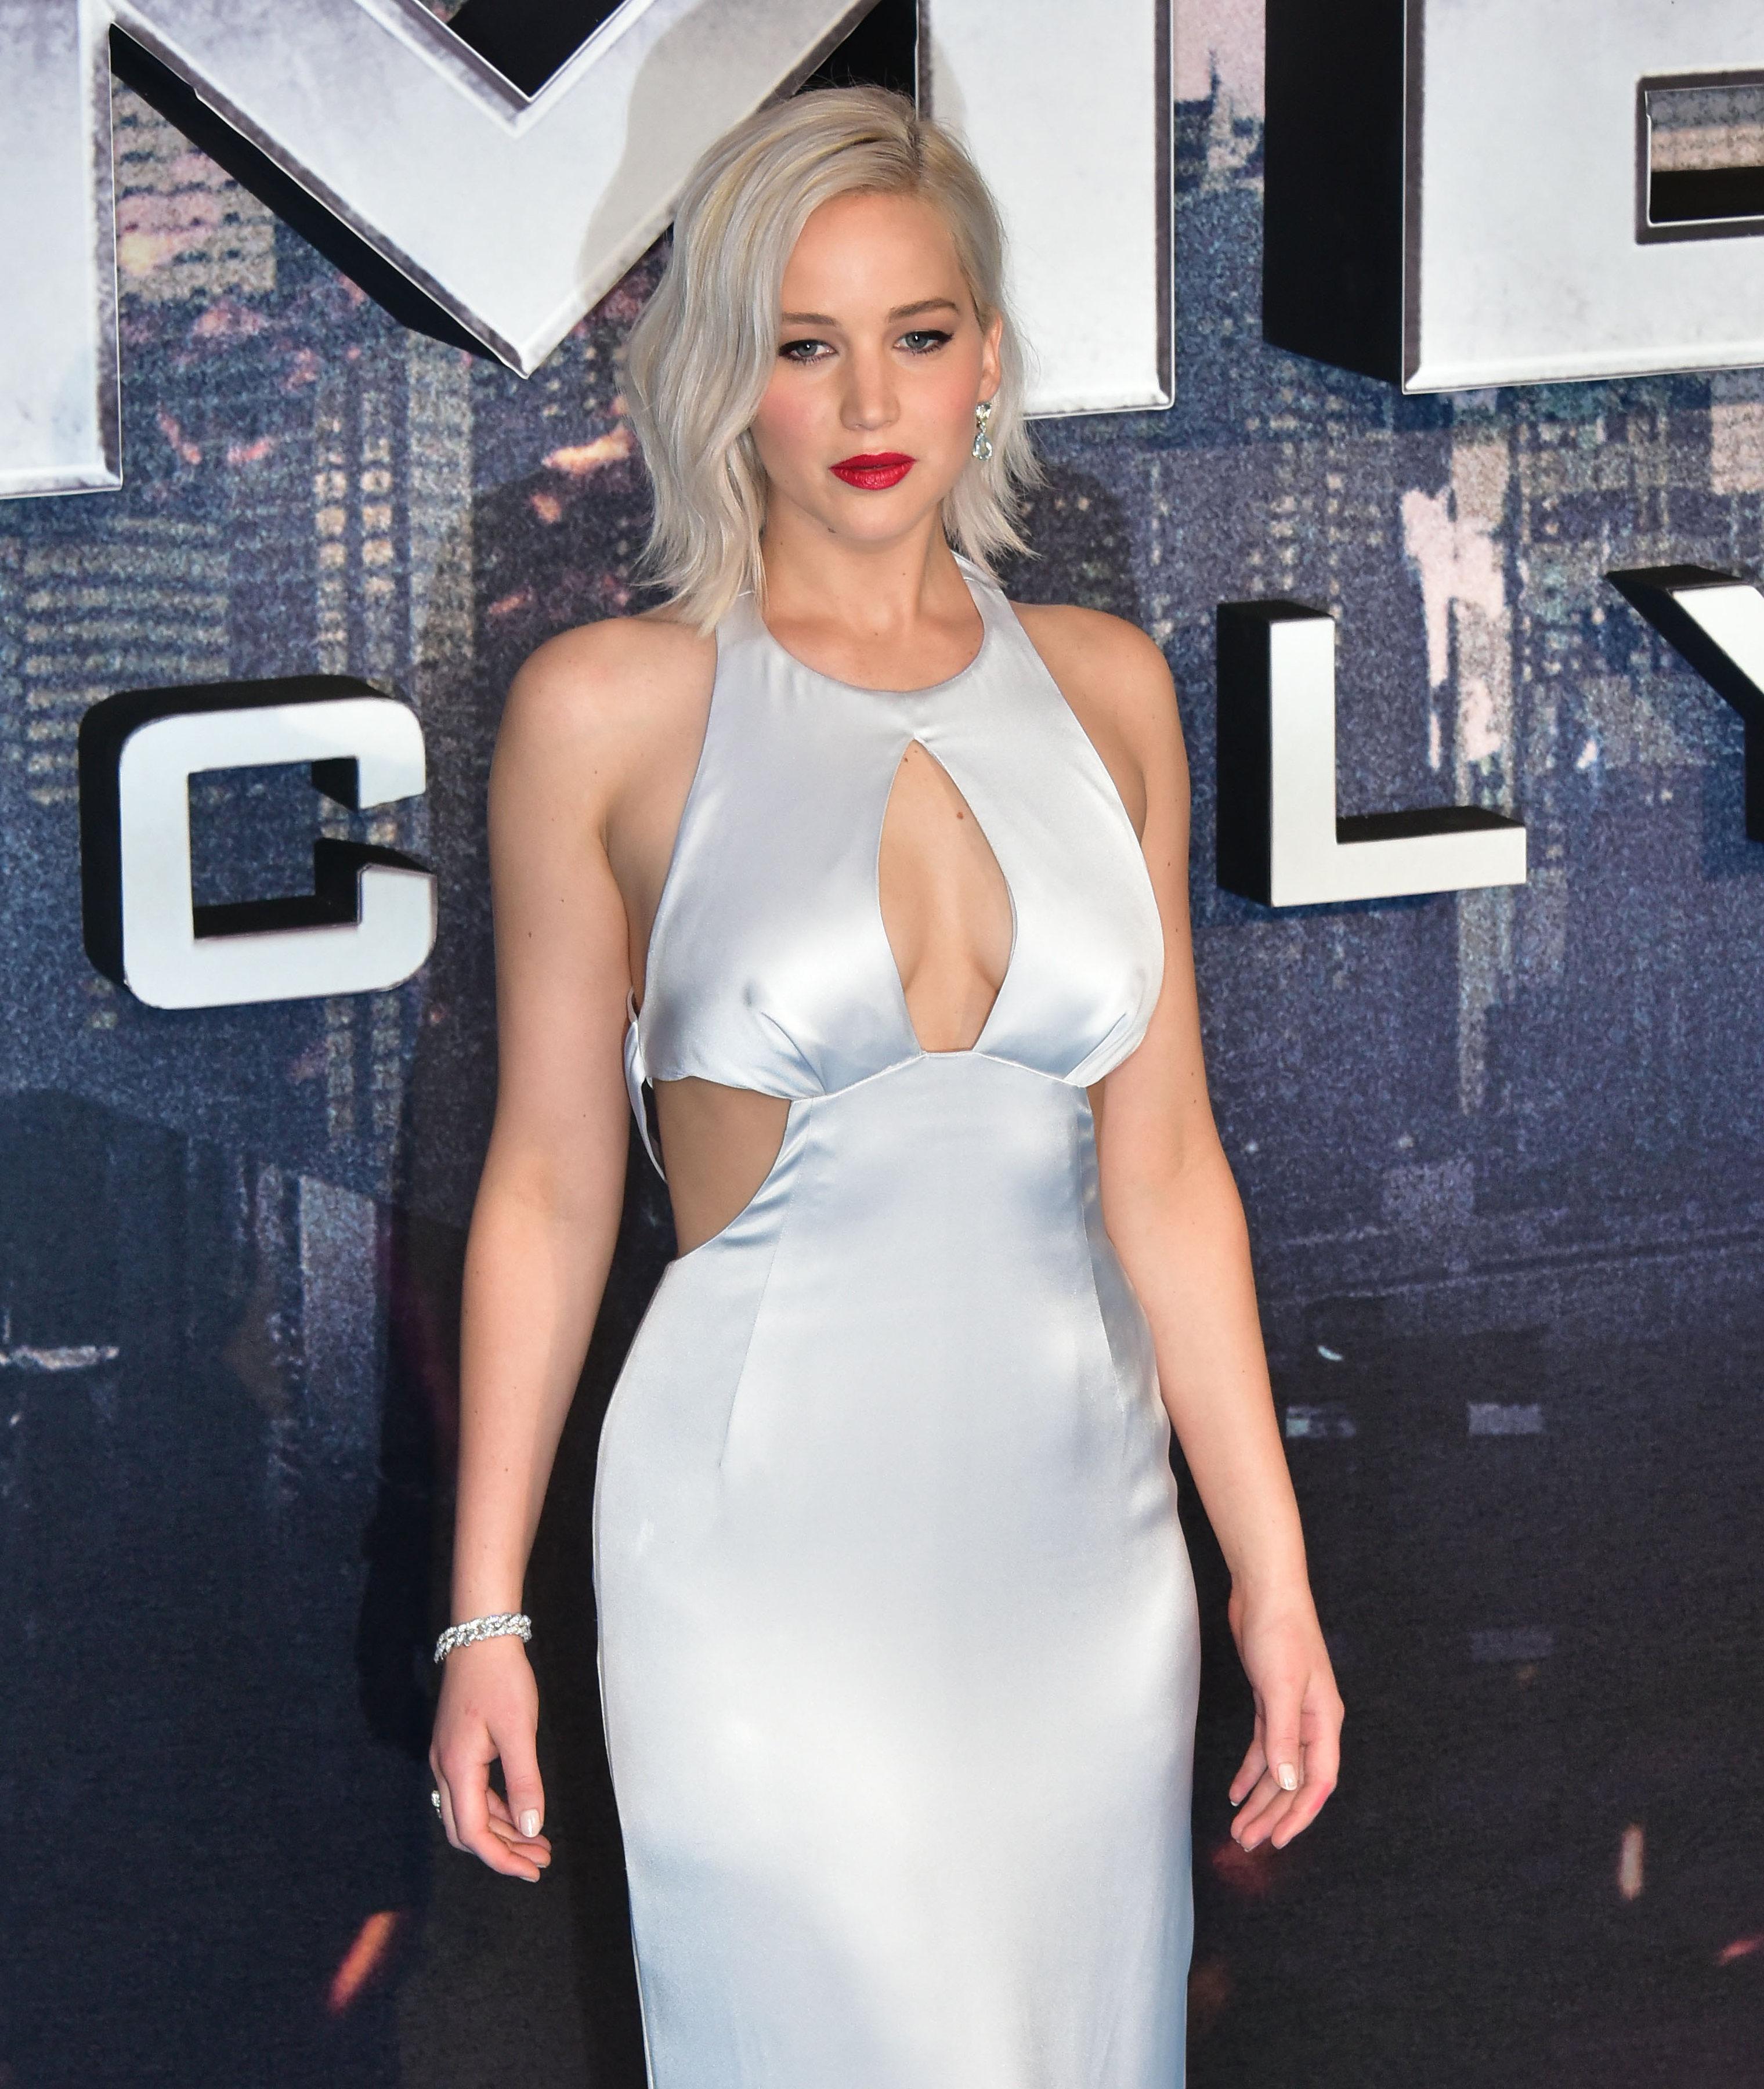 Jennifer Lawrence Presume Escotazo En Premiere De X-Men